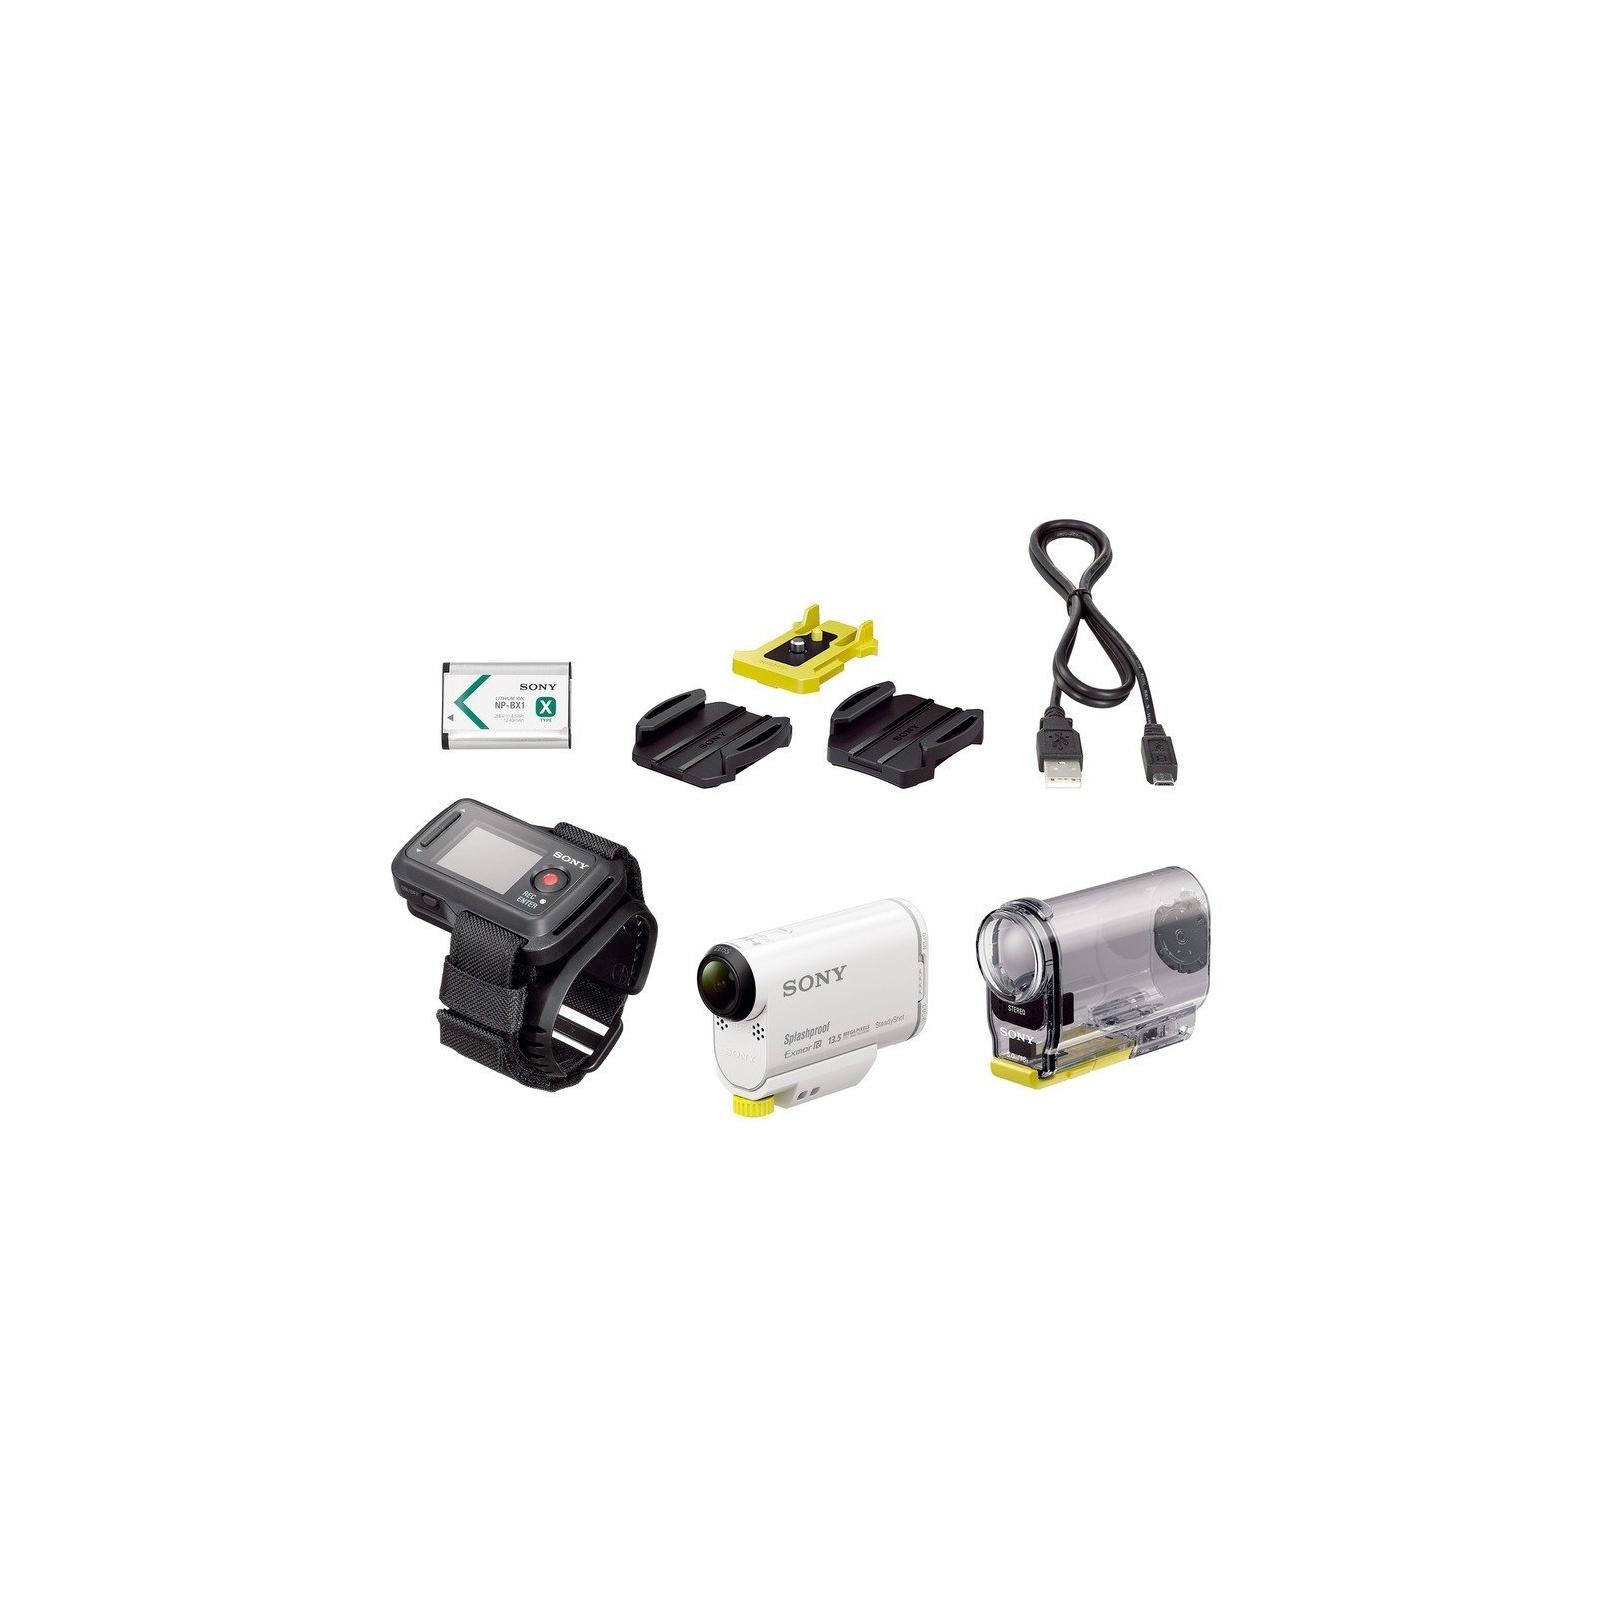 Экшн-камера SONY HDR-AS100V w/RM-LVR1 (HDRAS100VR.CEN) изображение 9